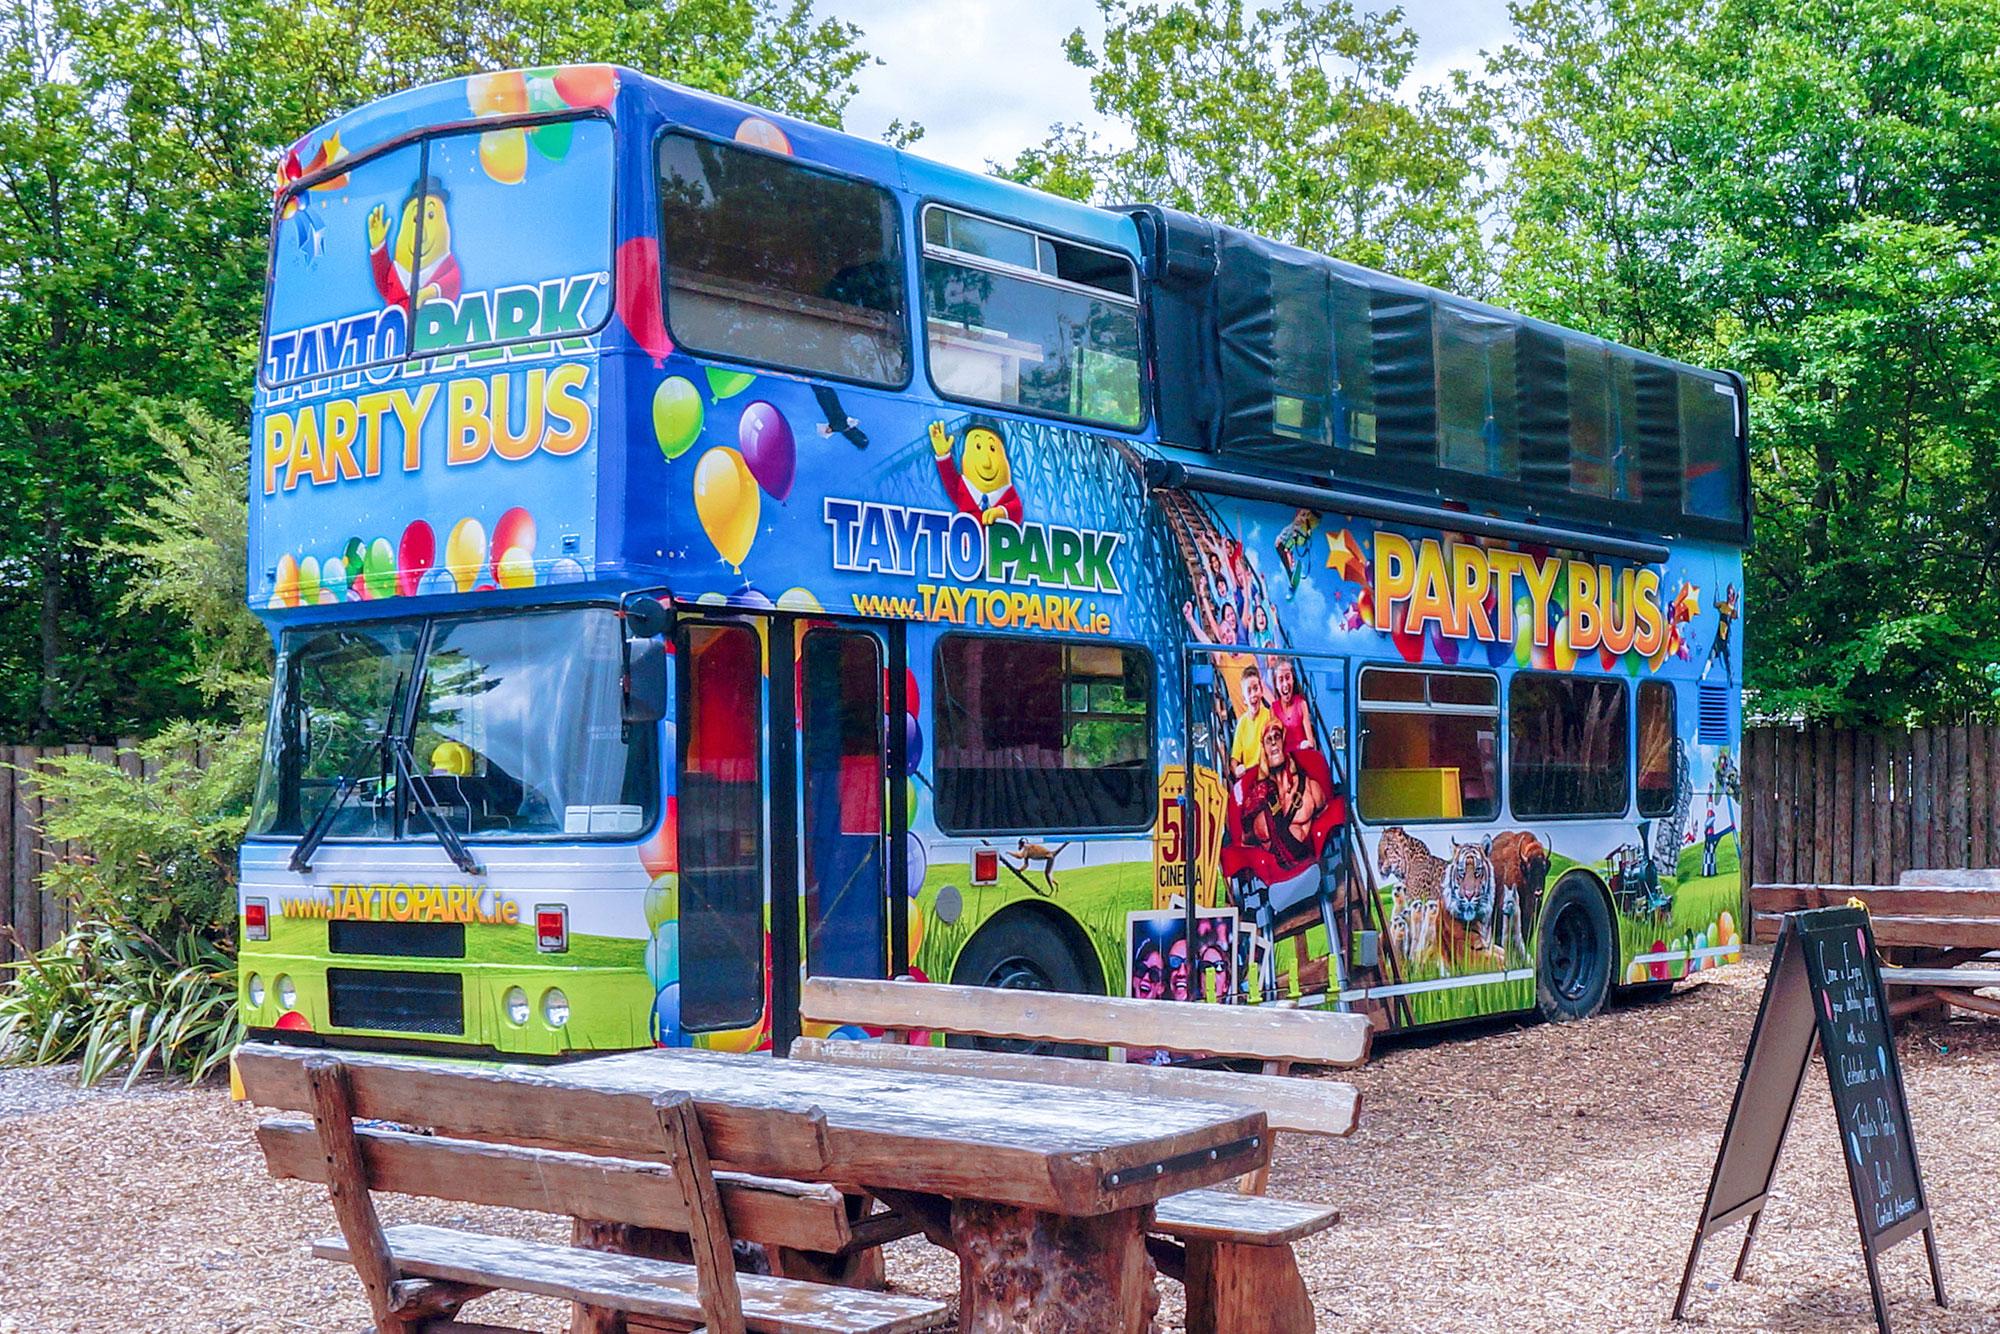 Tayto Park bus vehicle wrap decal graphic design freelance Dublin